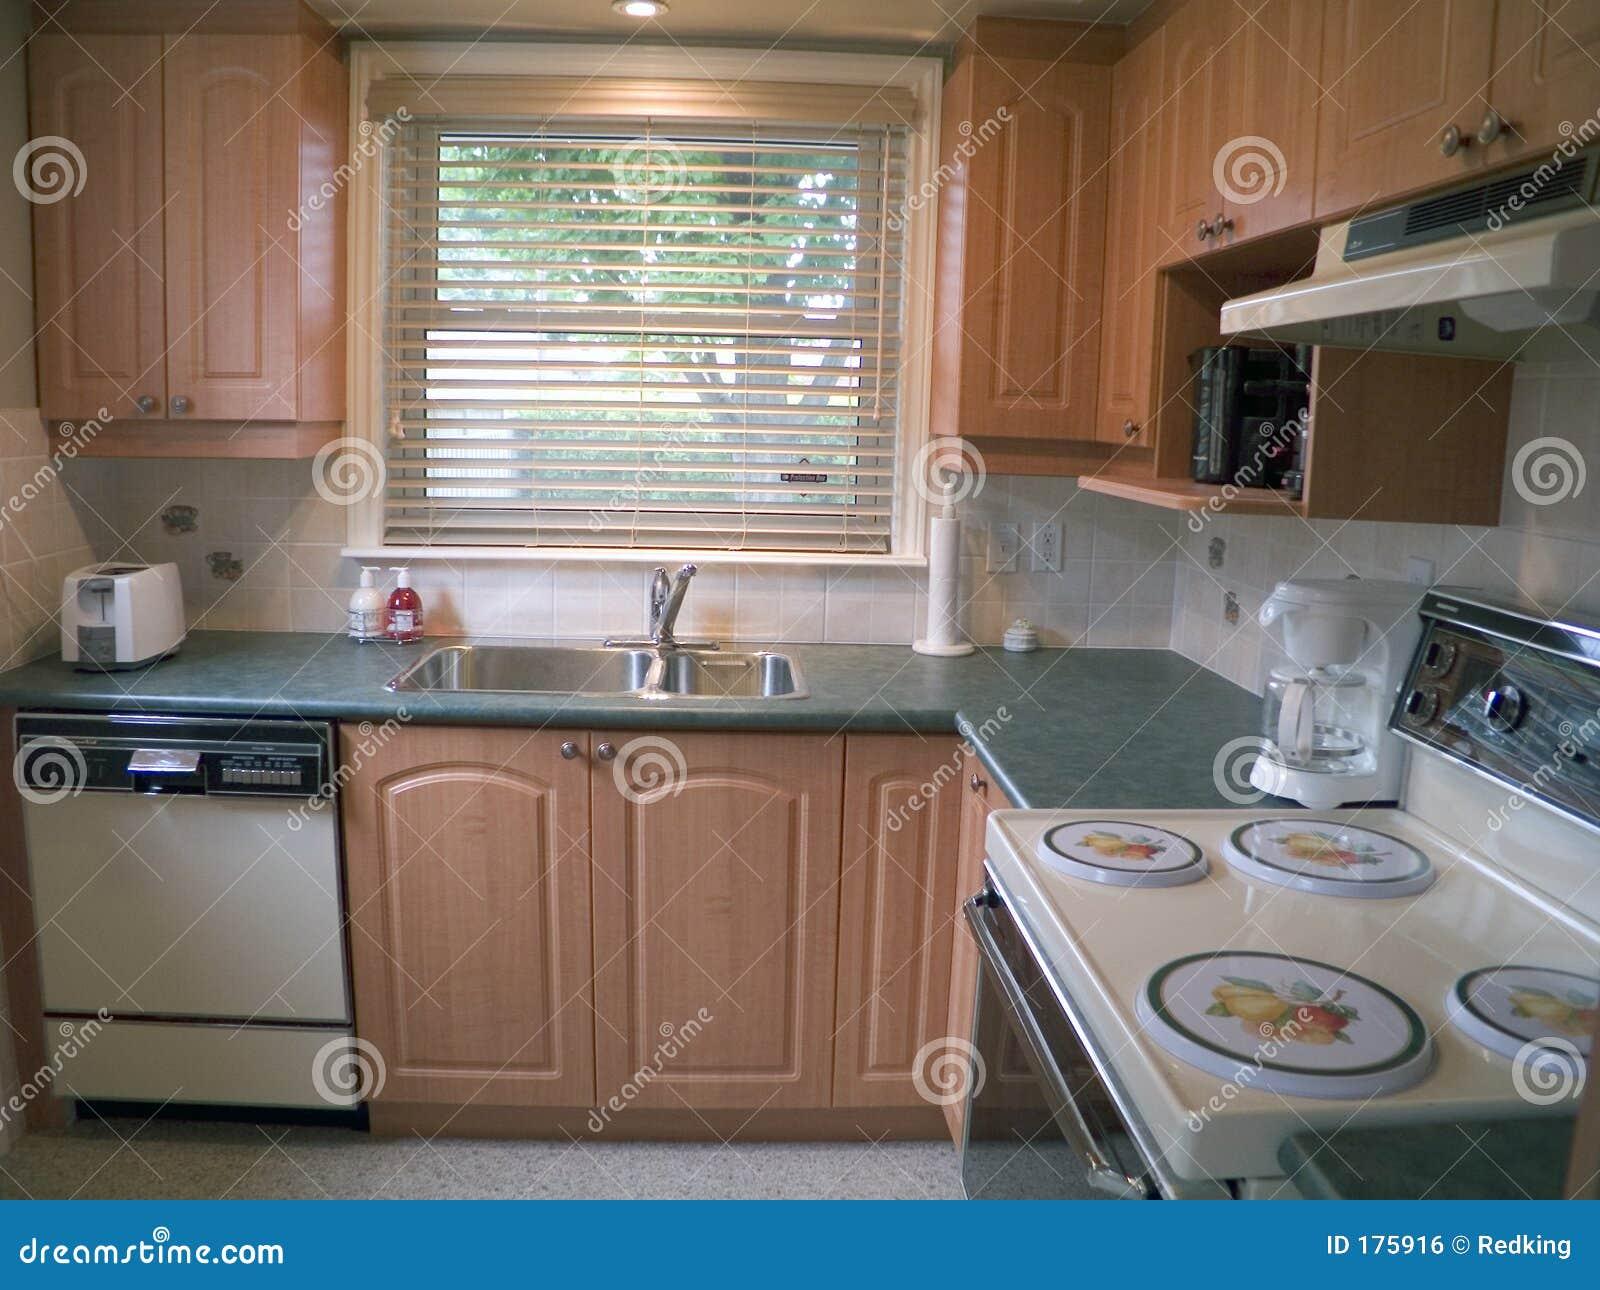 22 nowoczesnego kuchenne